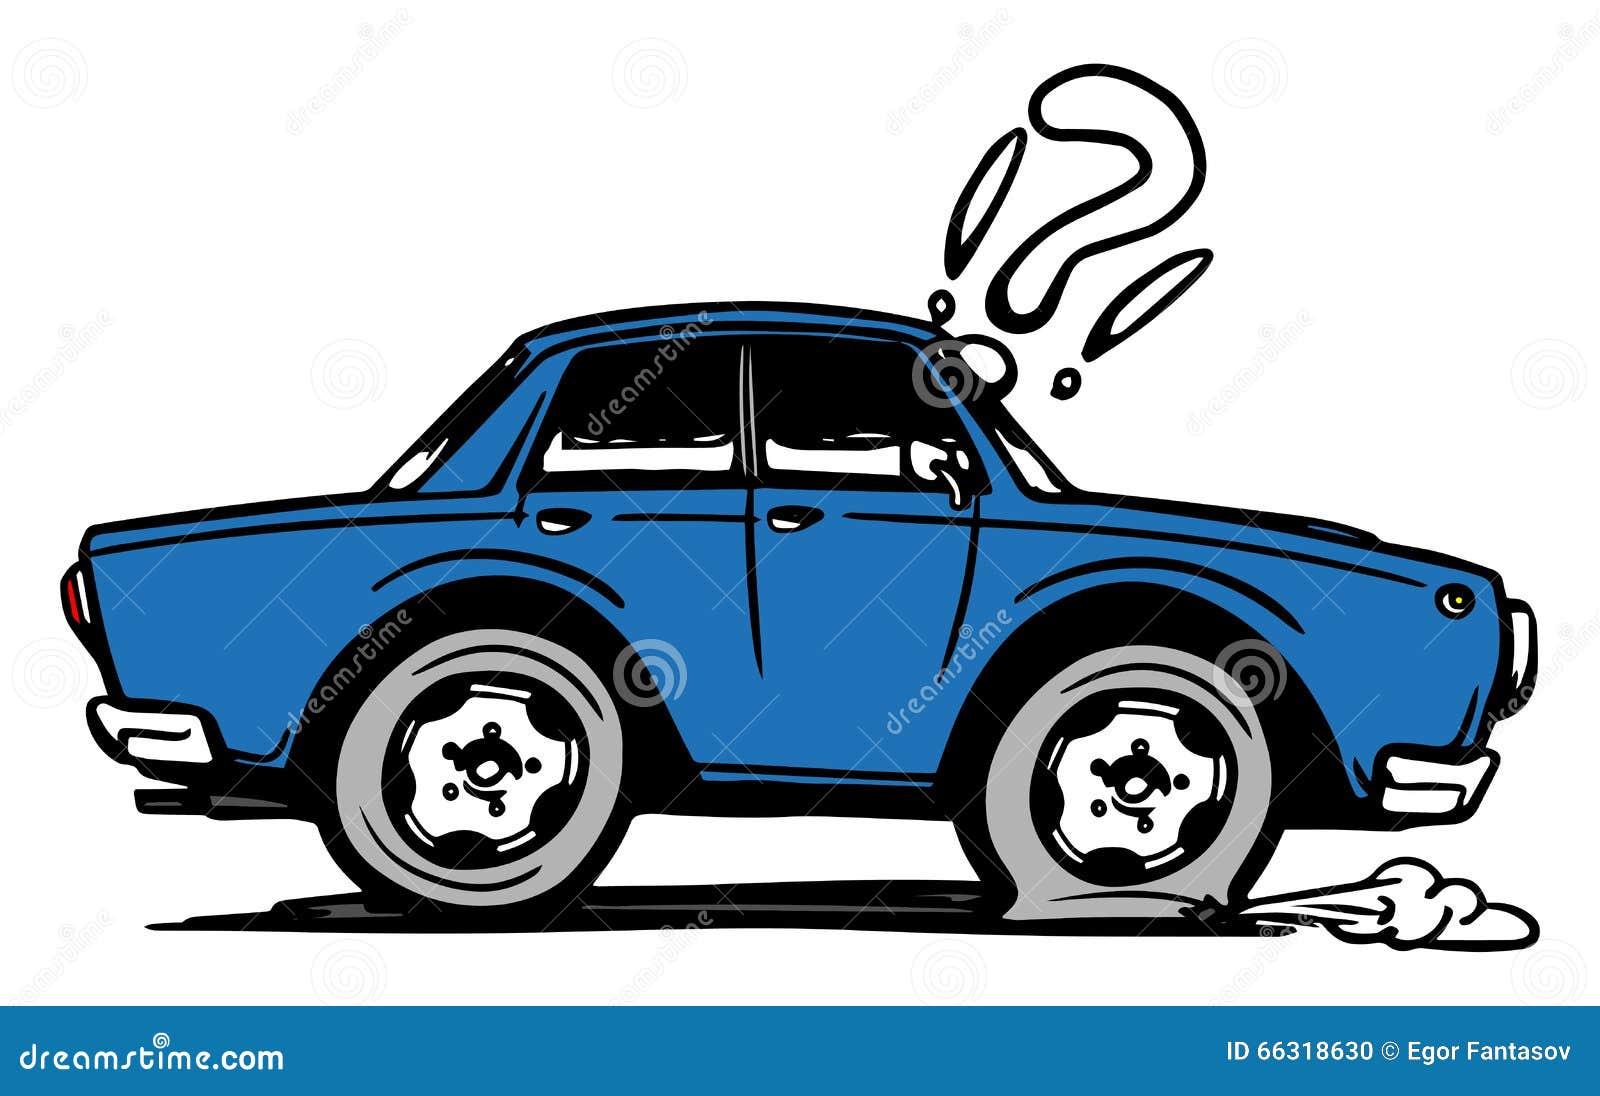 Tire Image - Cliparts.co  Flat Tires Cartoon Hands